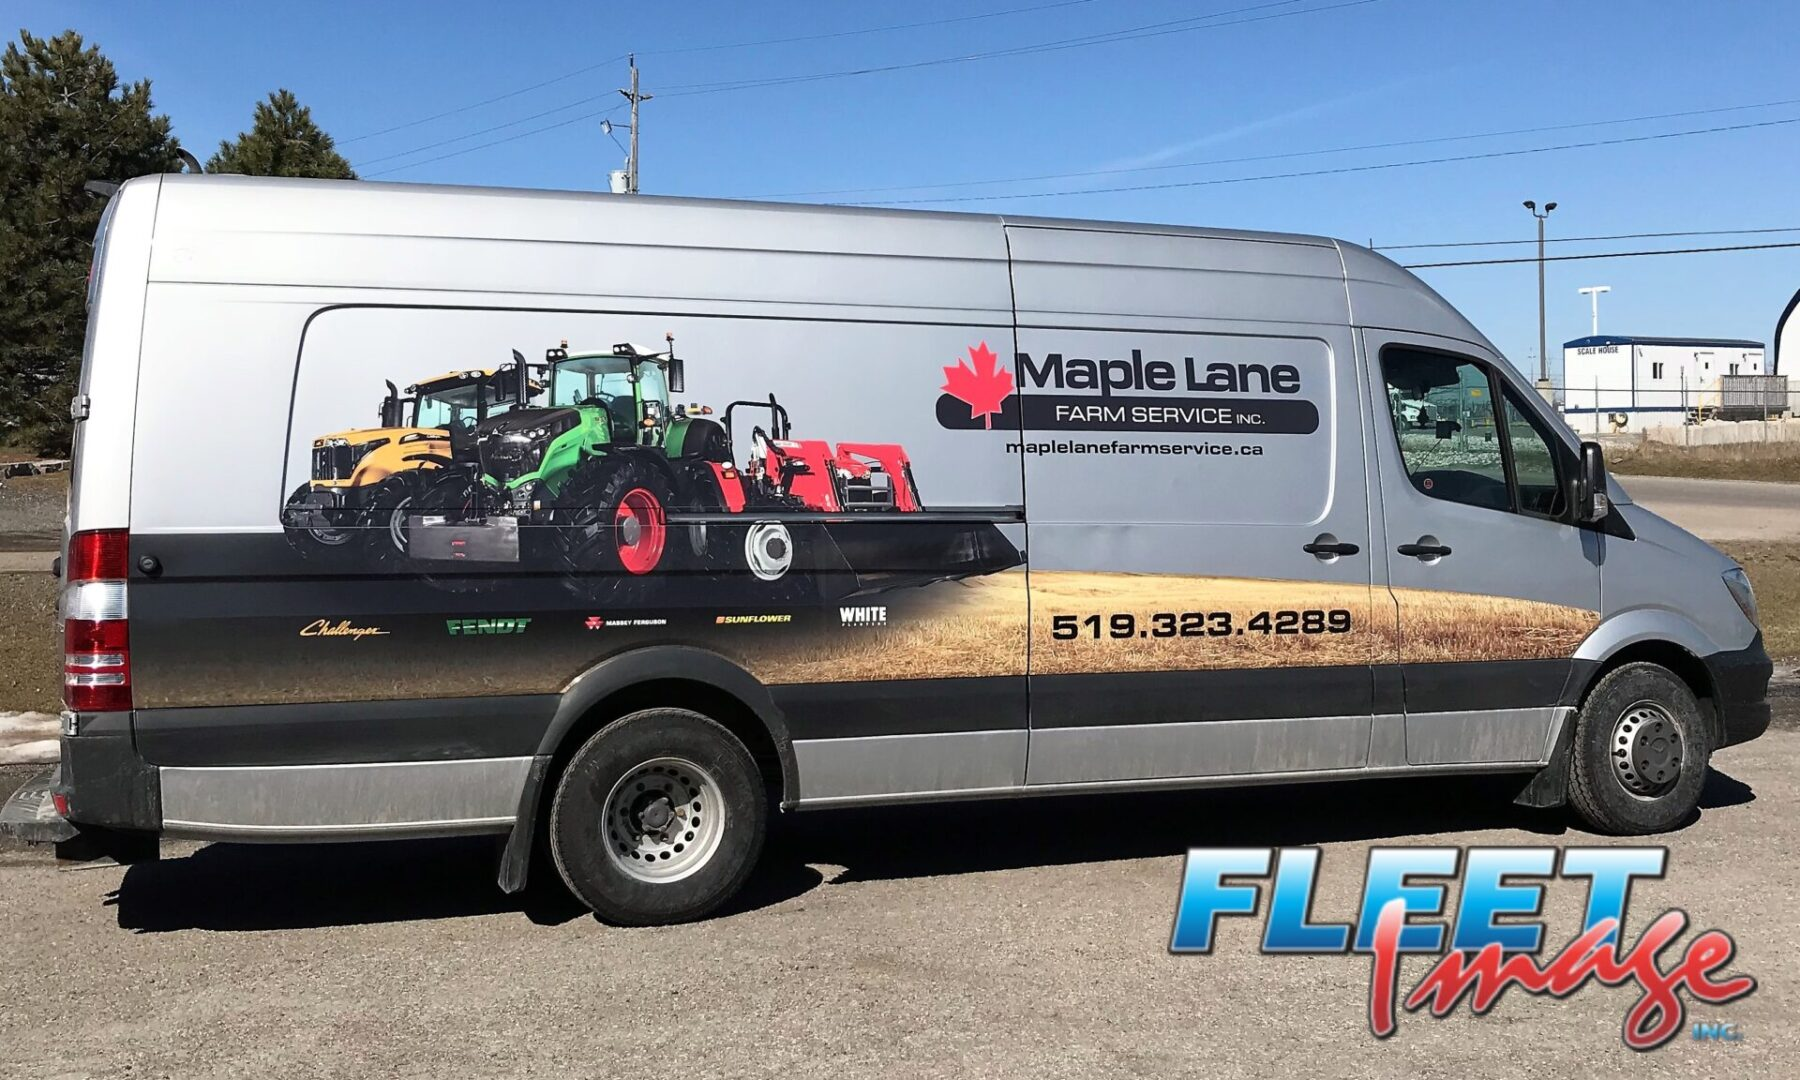 Vehicle with aMaple Lane Farm Service Inc. decal sticker